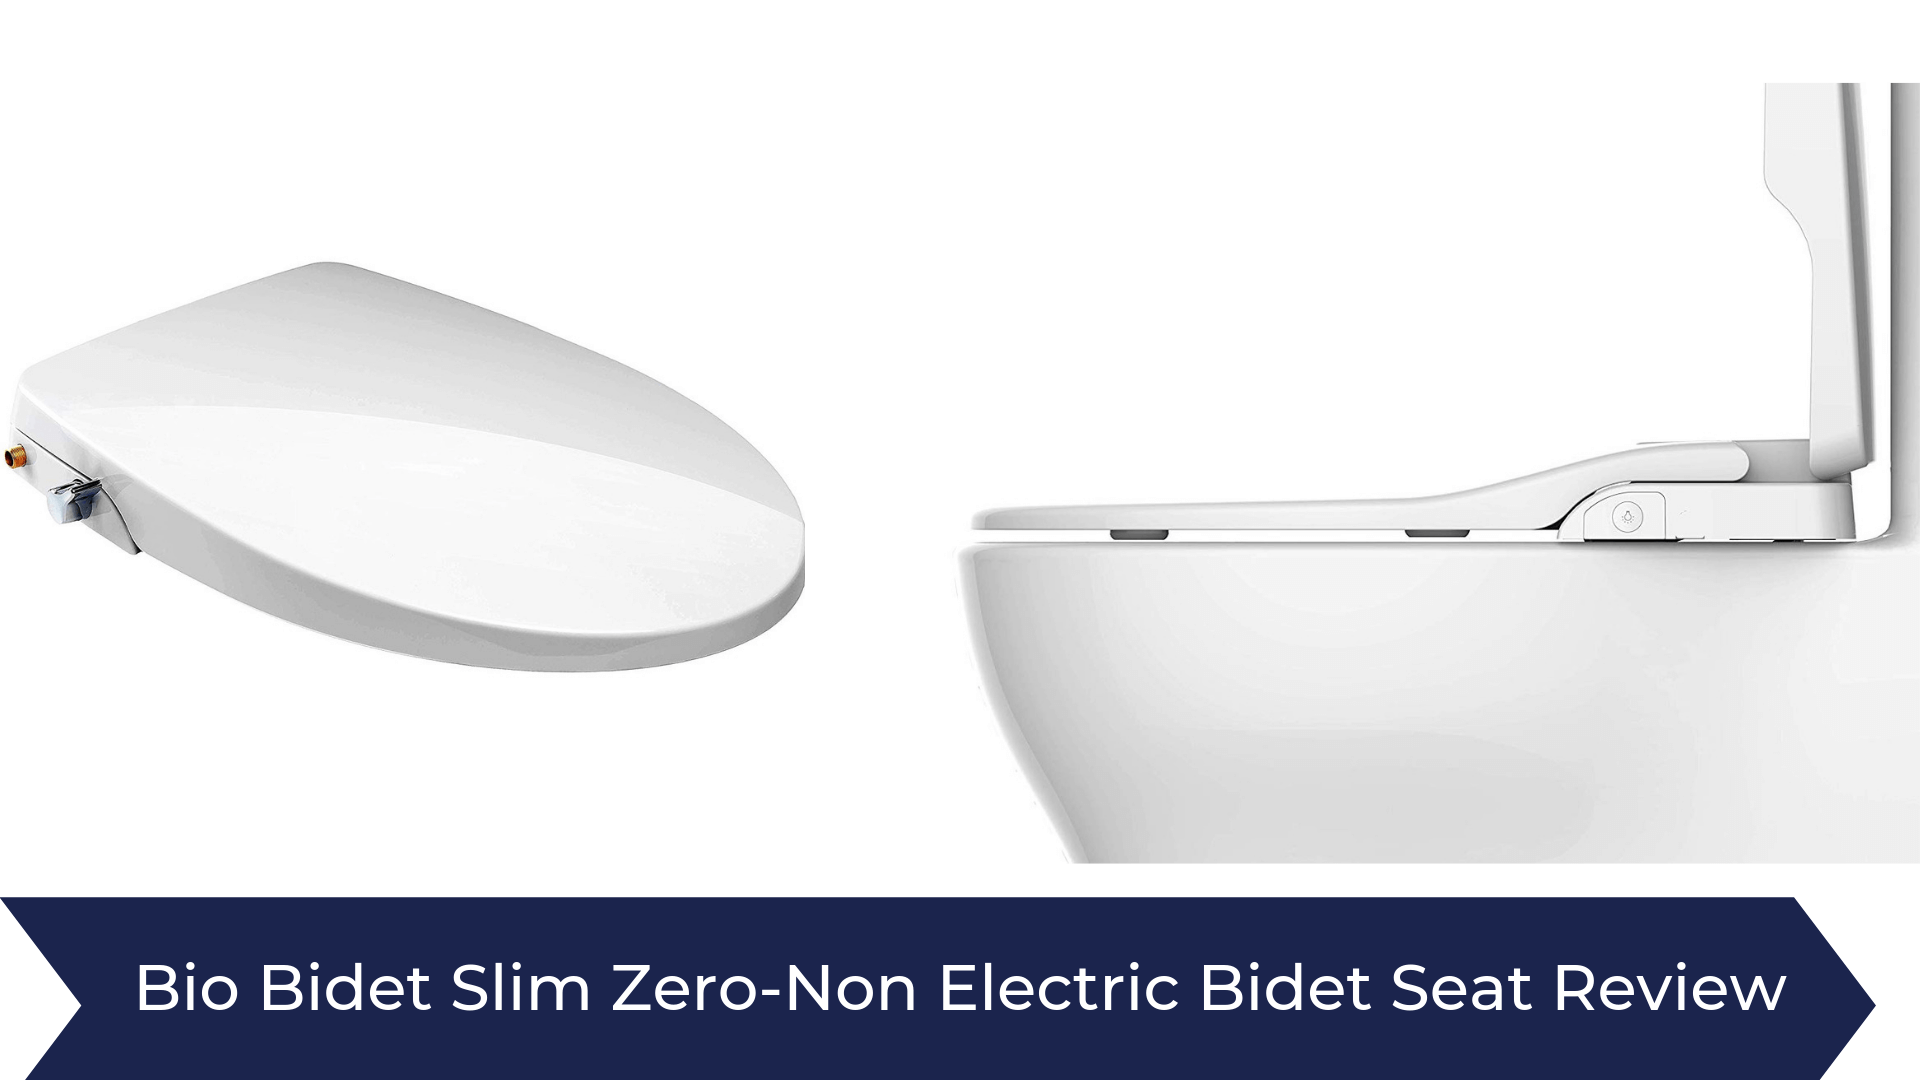 Bio Bidet Slim Zero-Non Electric Bidet Seat Review